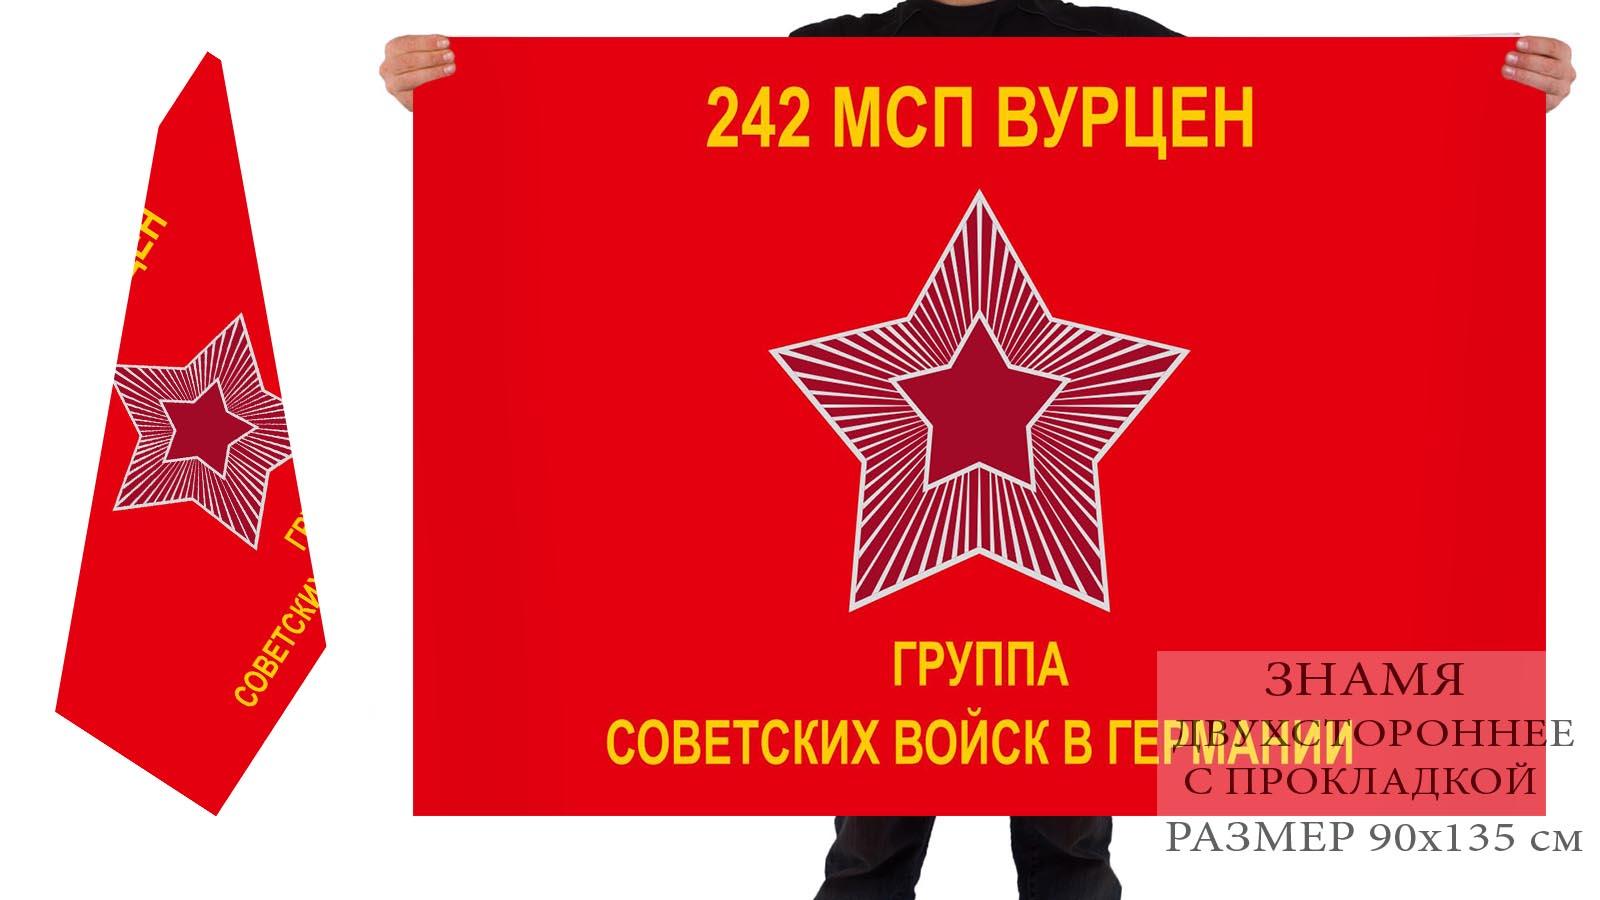 Двусторонний флаг ГСВГ 242 МСП Вурцен